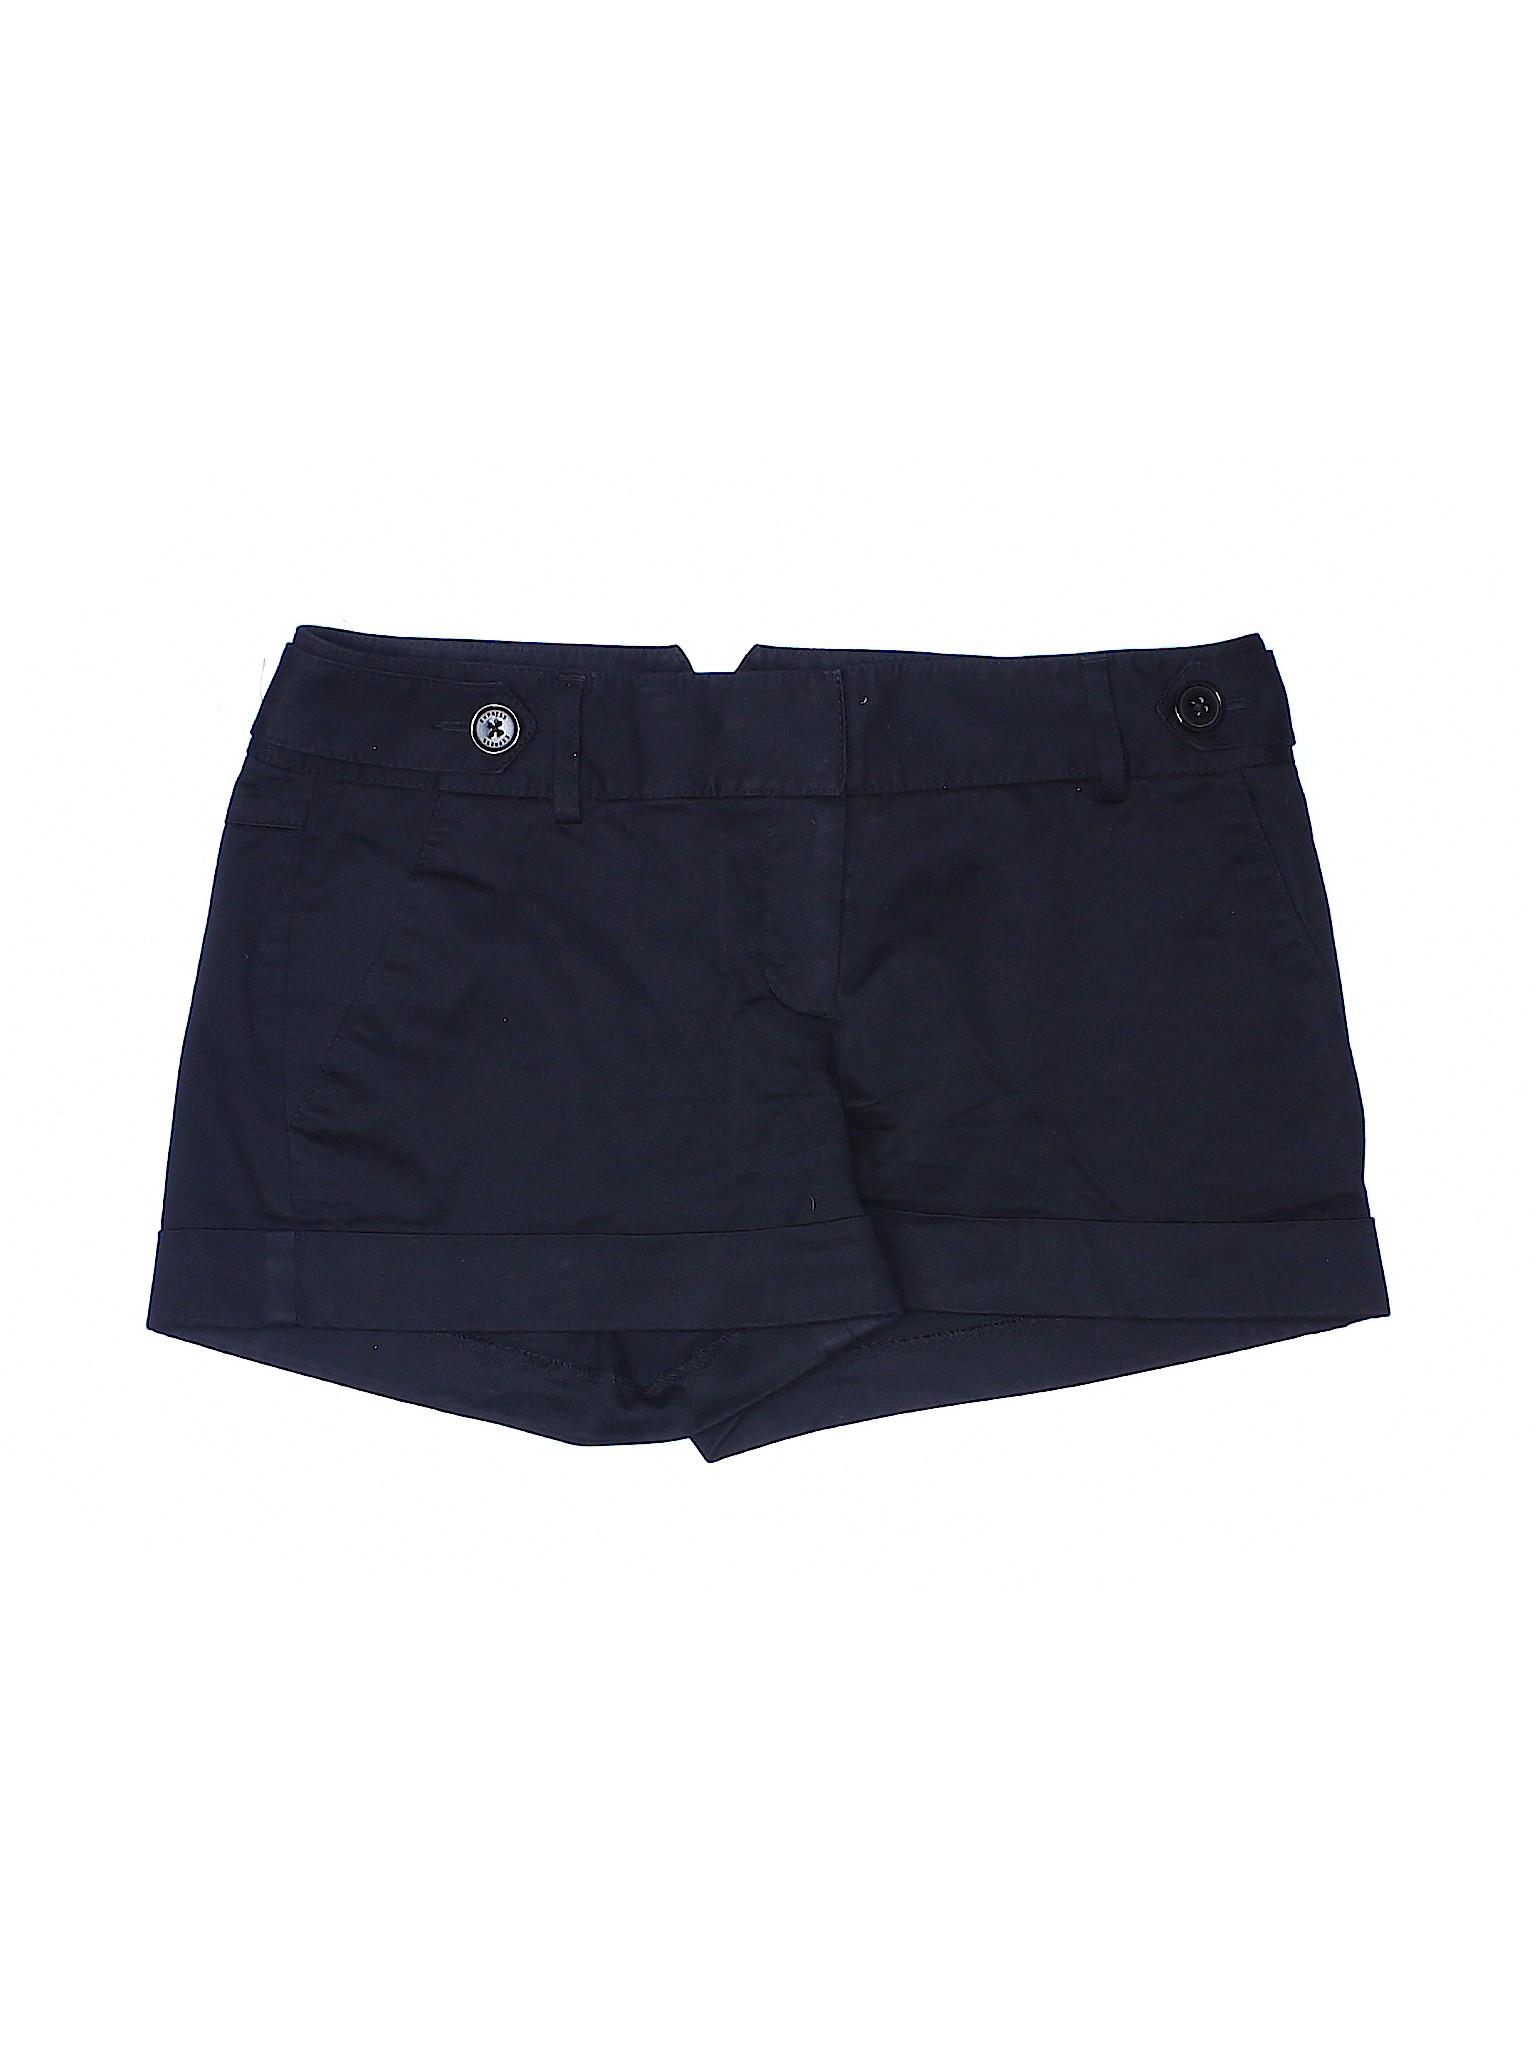 Boutique Express Shorts Express Khaki Khaki Shorts Boutique rHwrq5